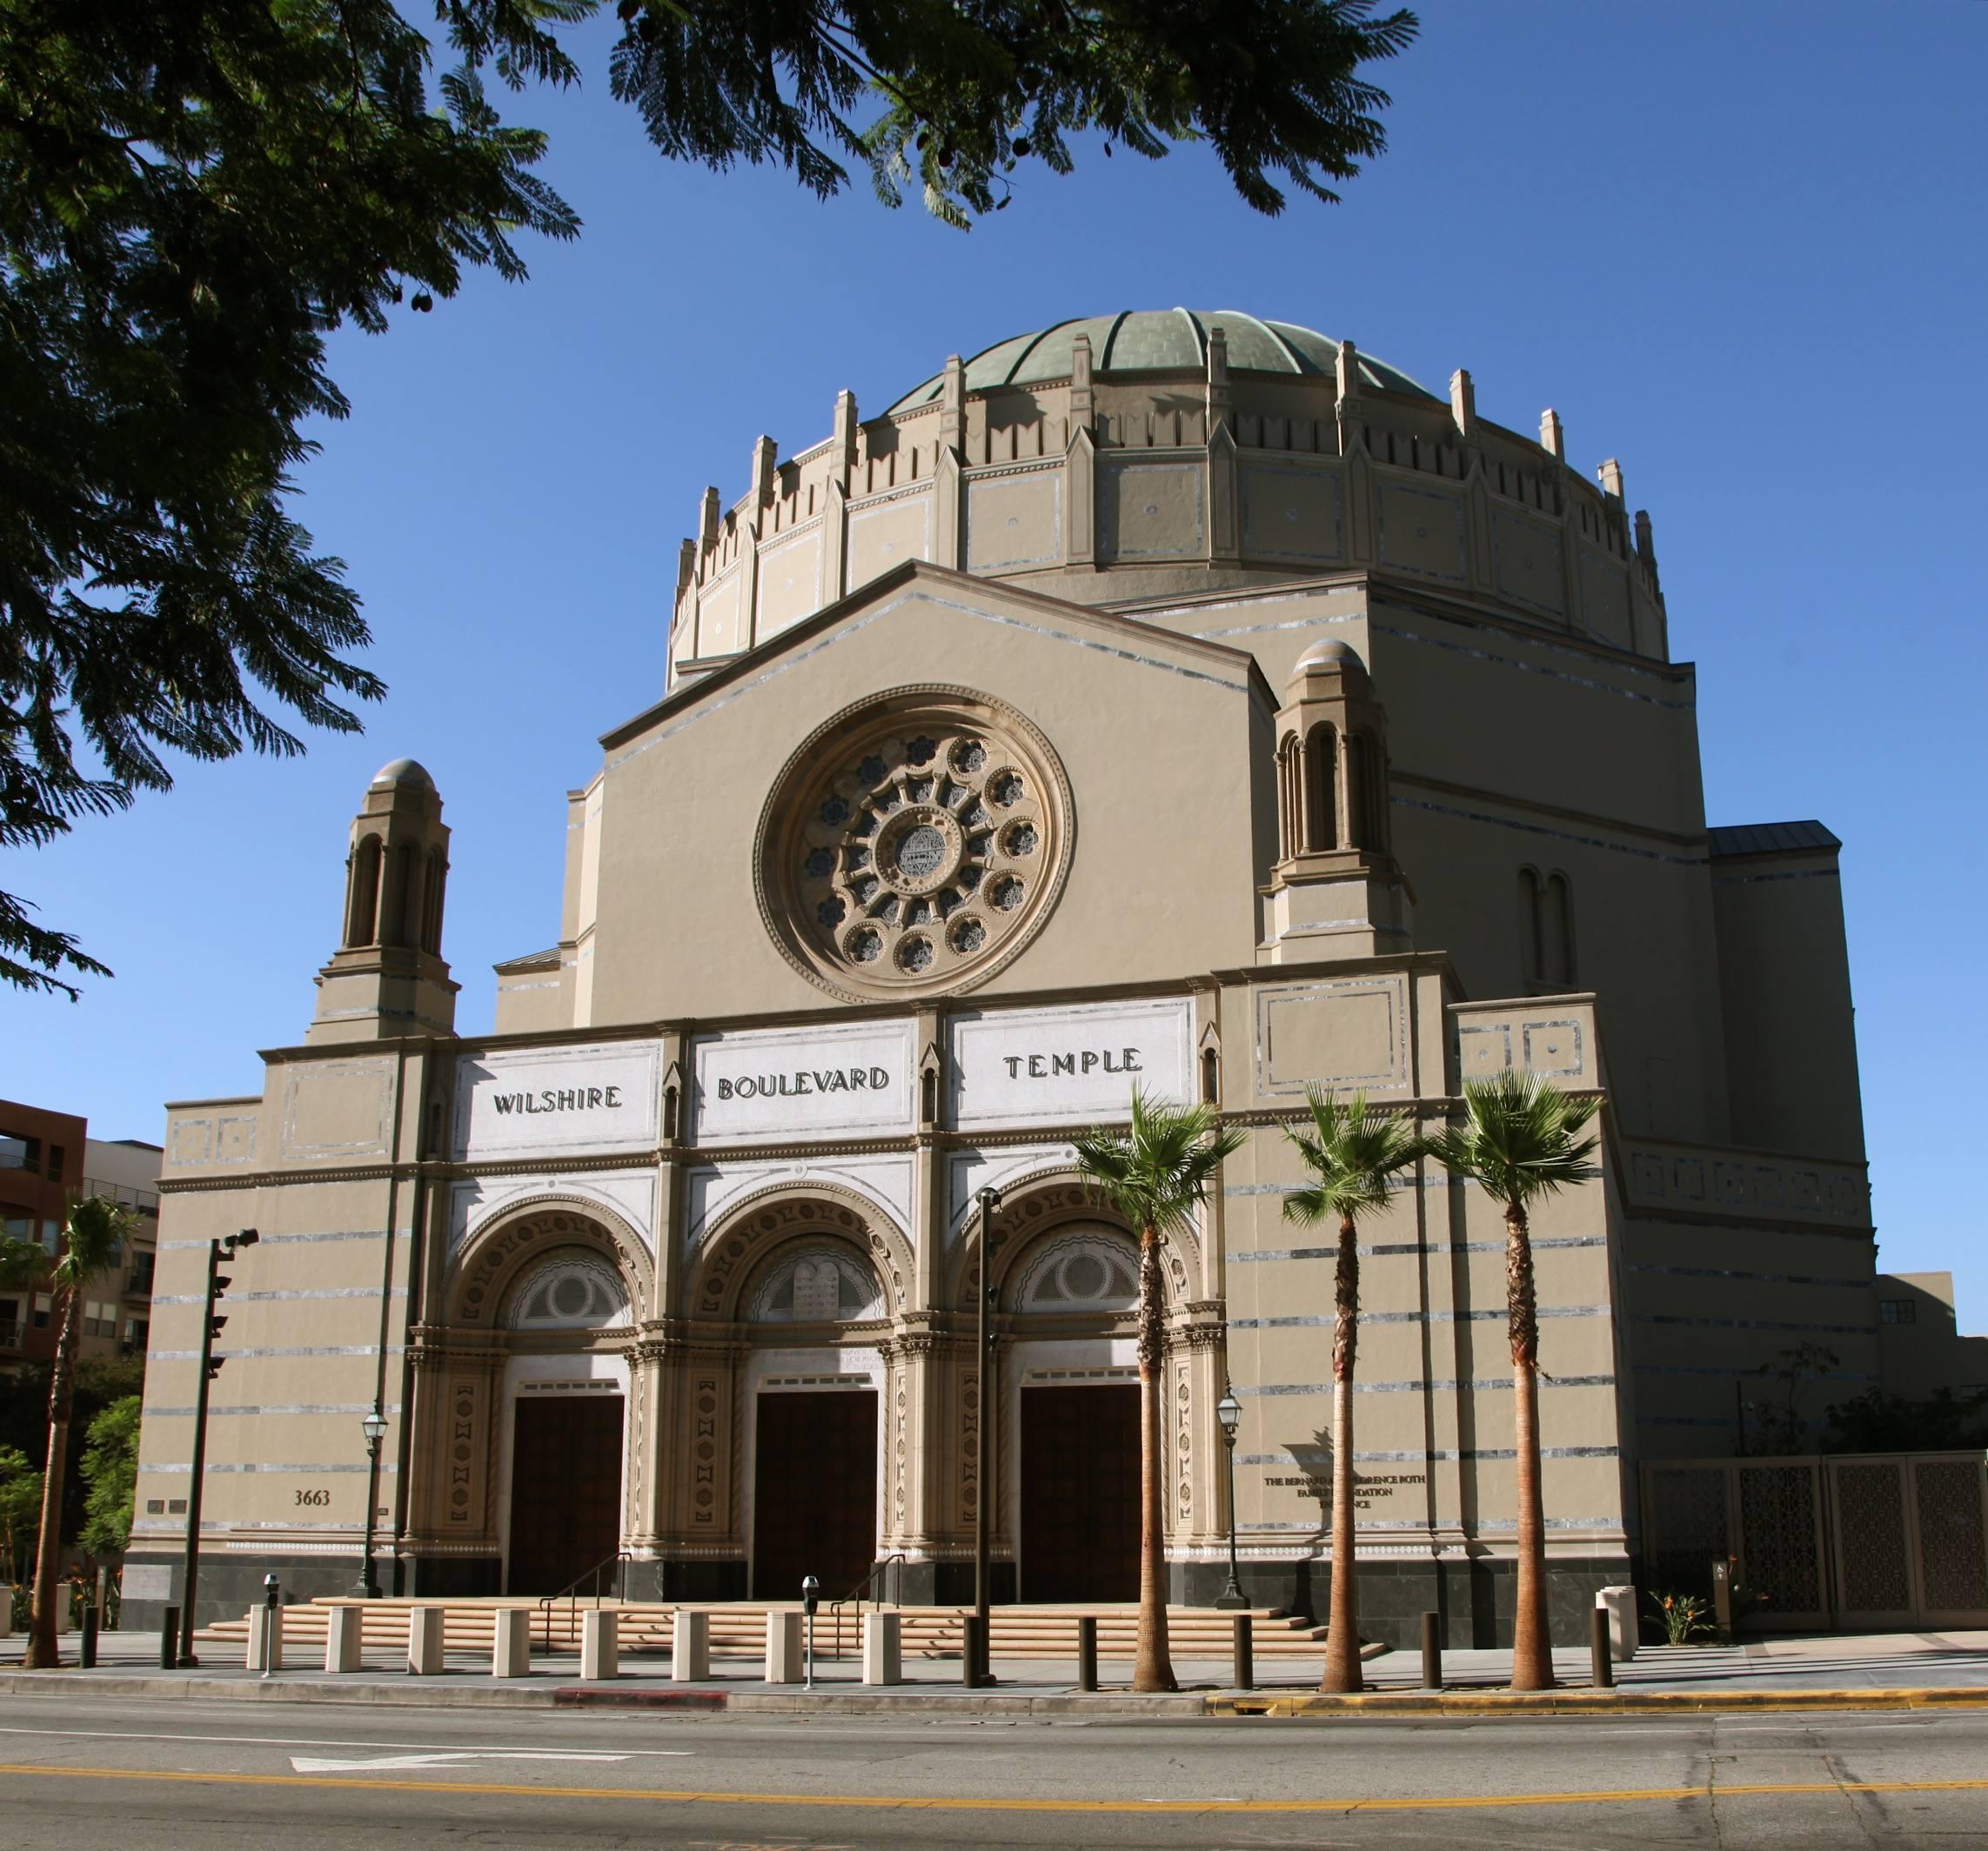 Wilshire Boulevard Temple exterior